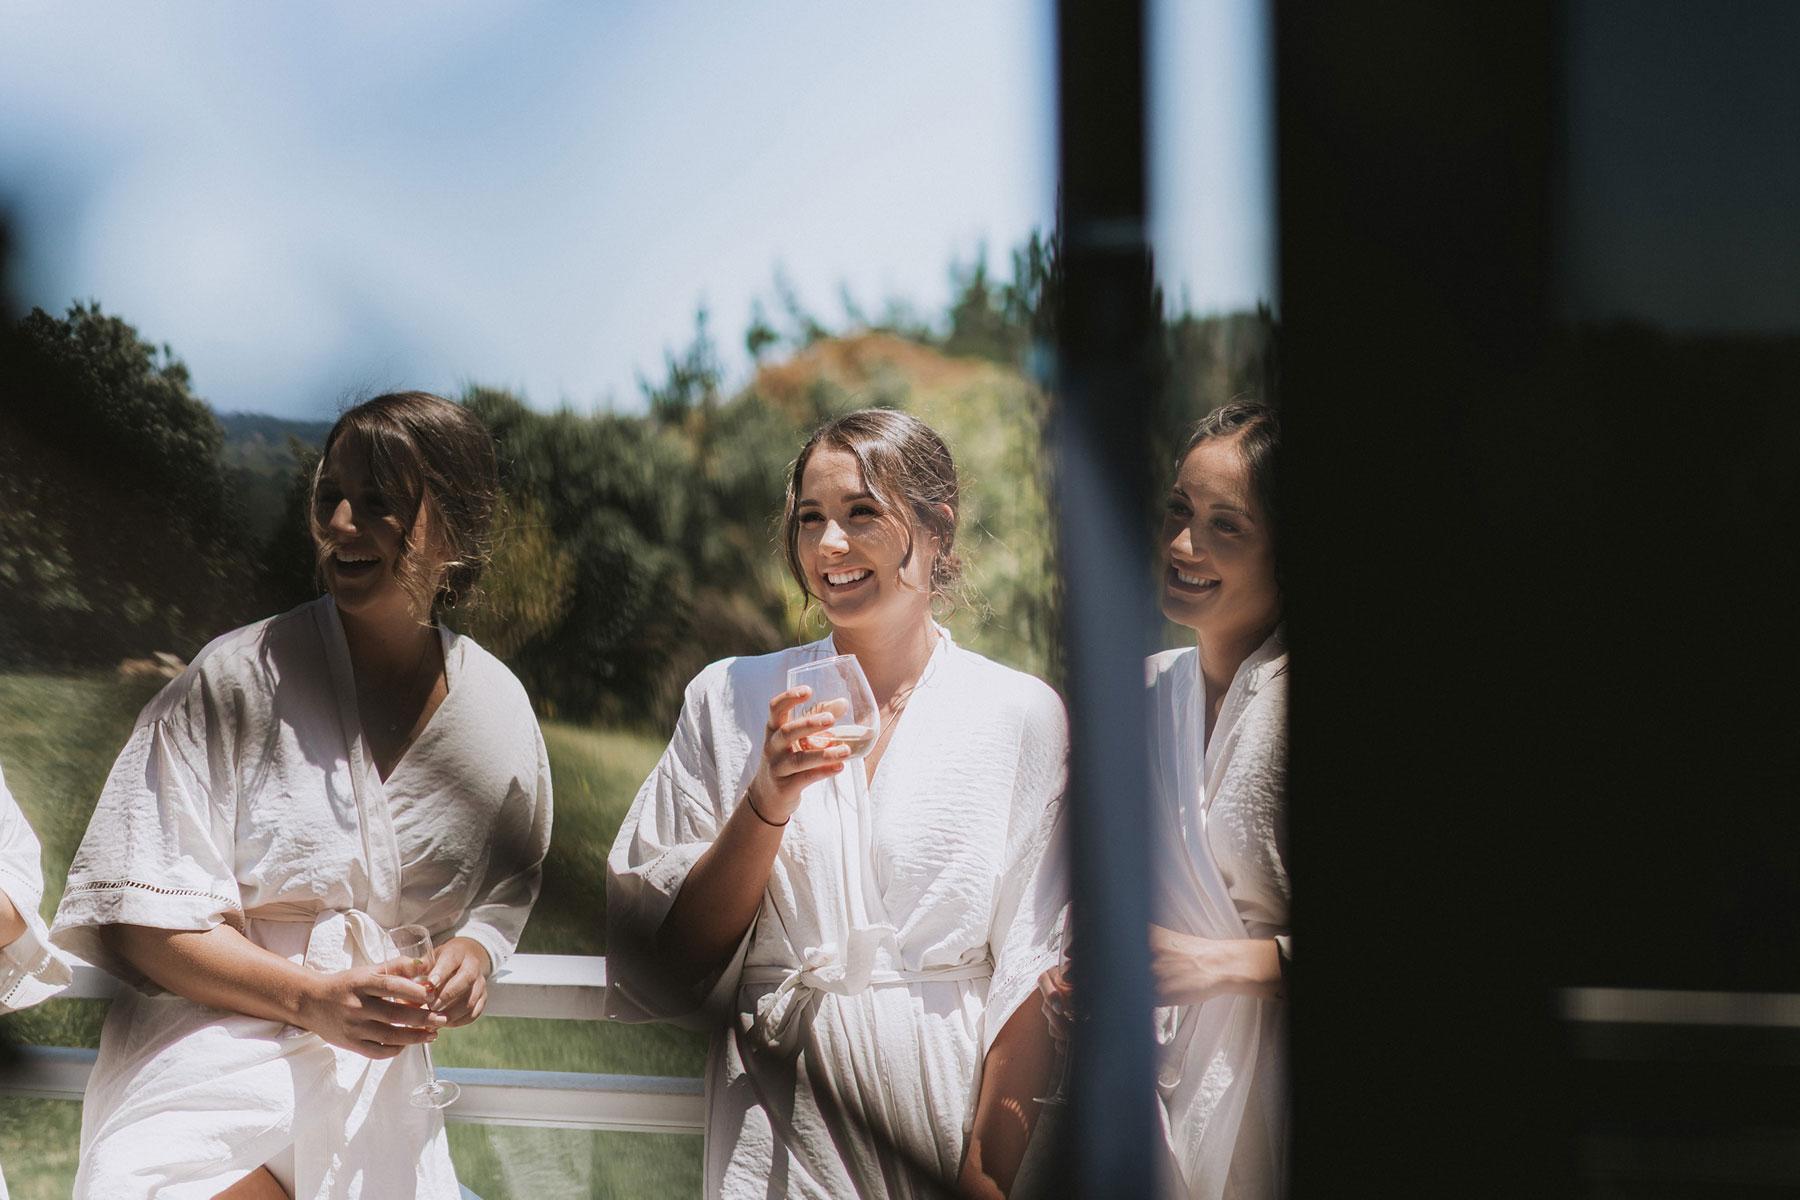 newfound-j-n-orua-beach-house-coromandel-wedding-photographers-17